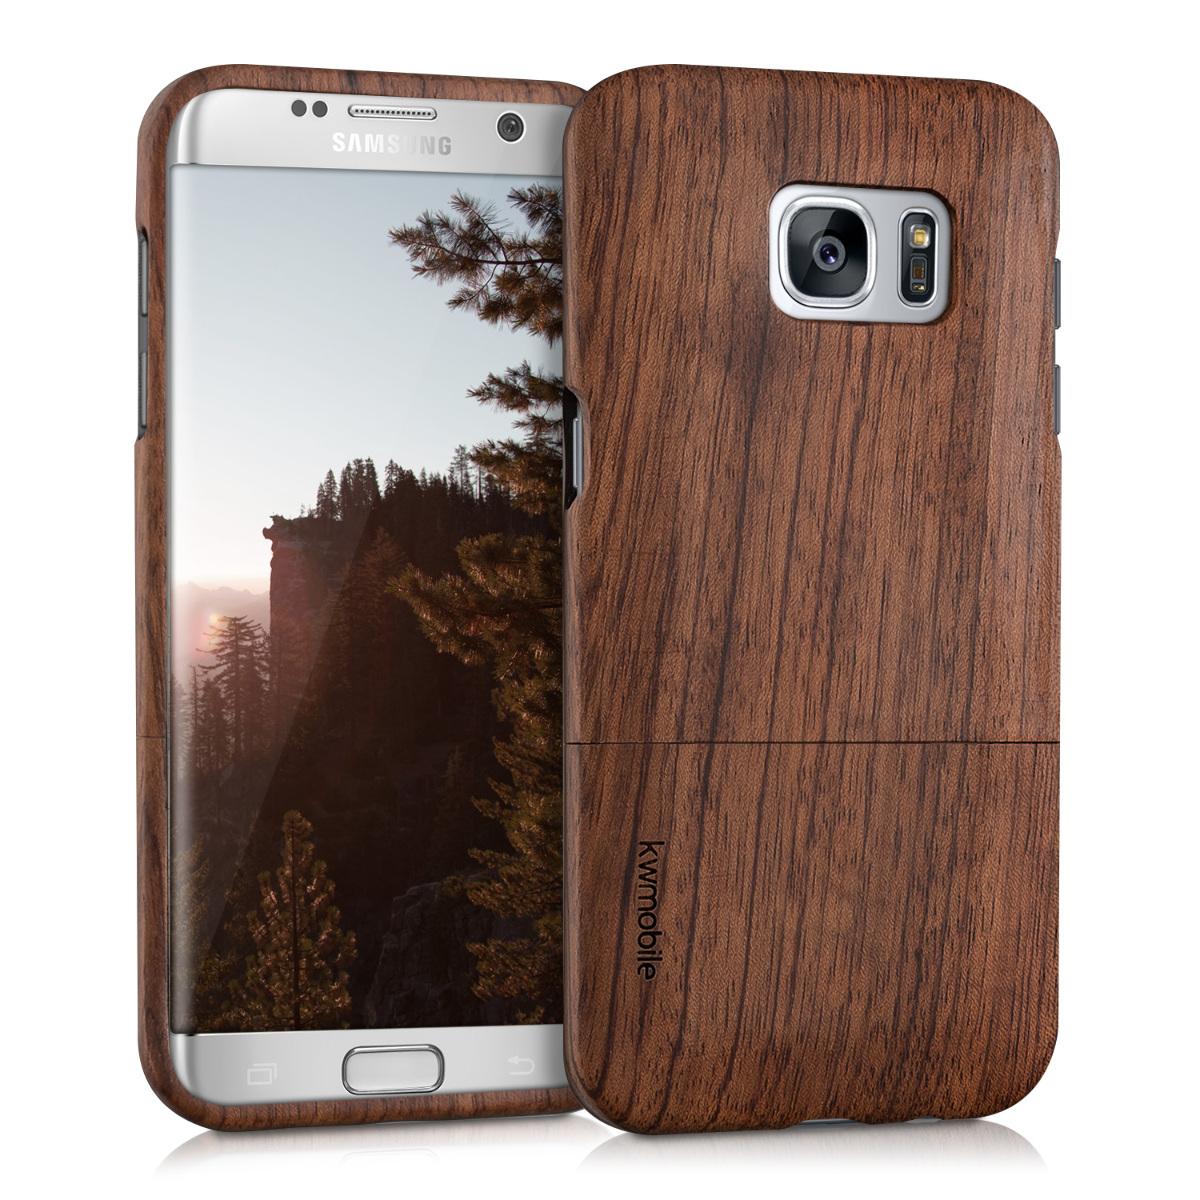 KW Σκληρή Ξύλινη Θήκη Samsung Galaxy S7 edge - (37150.05)